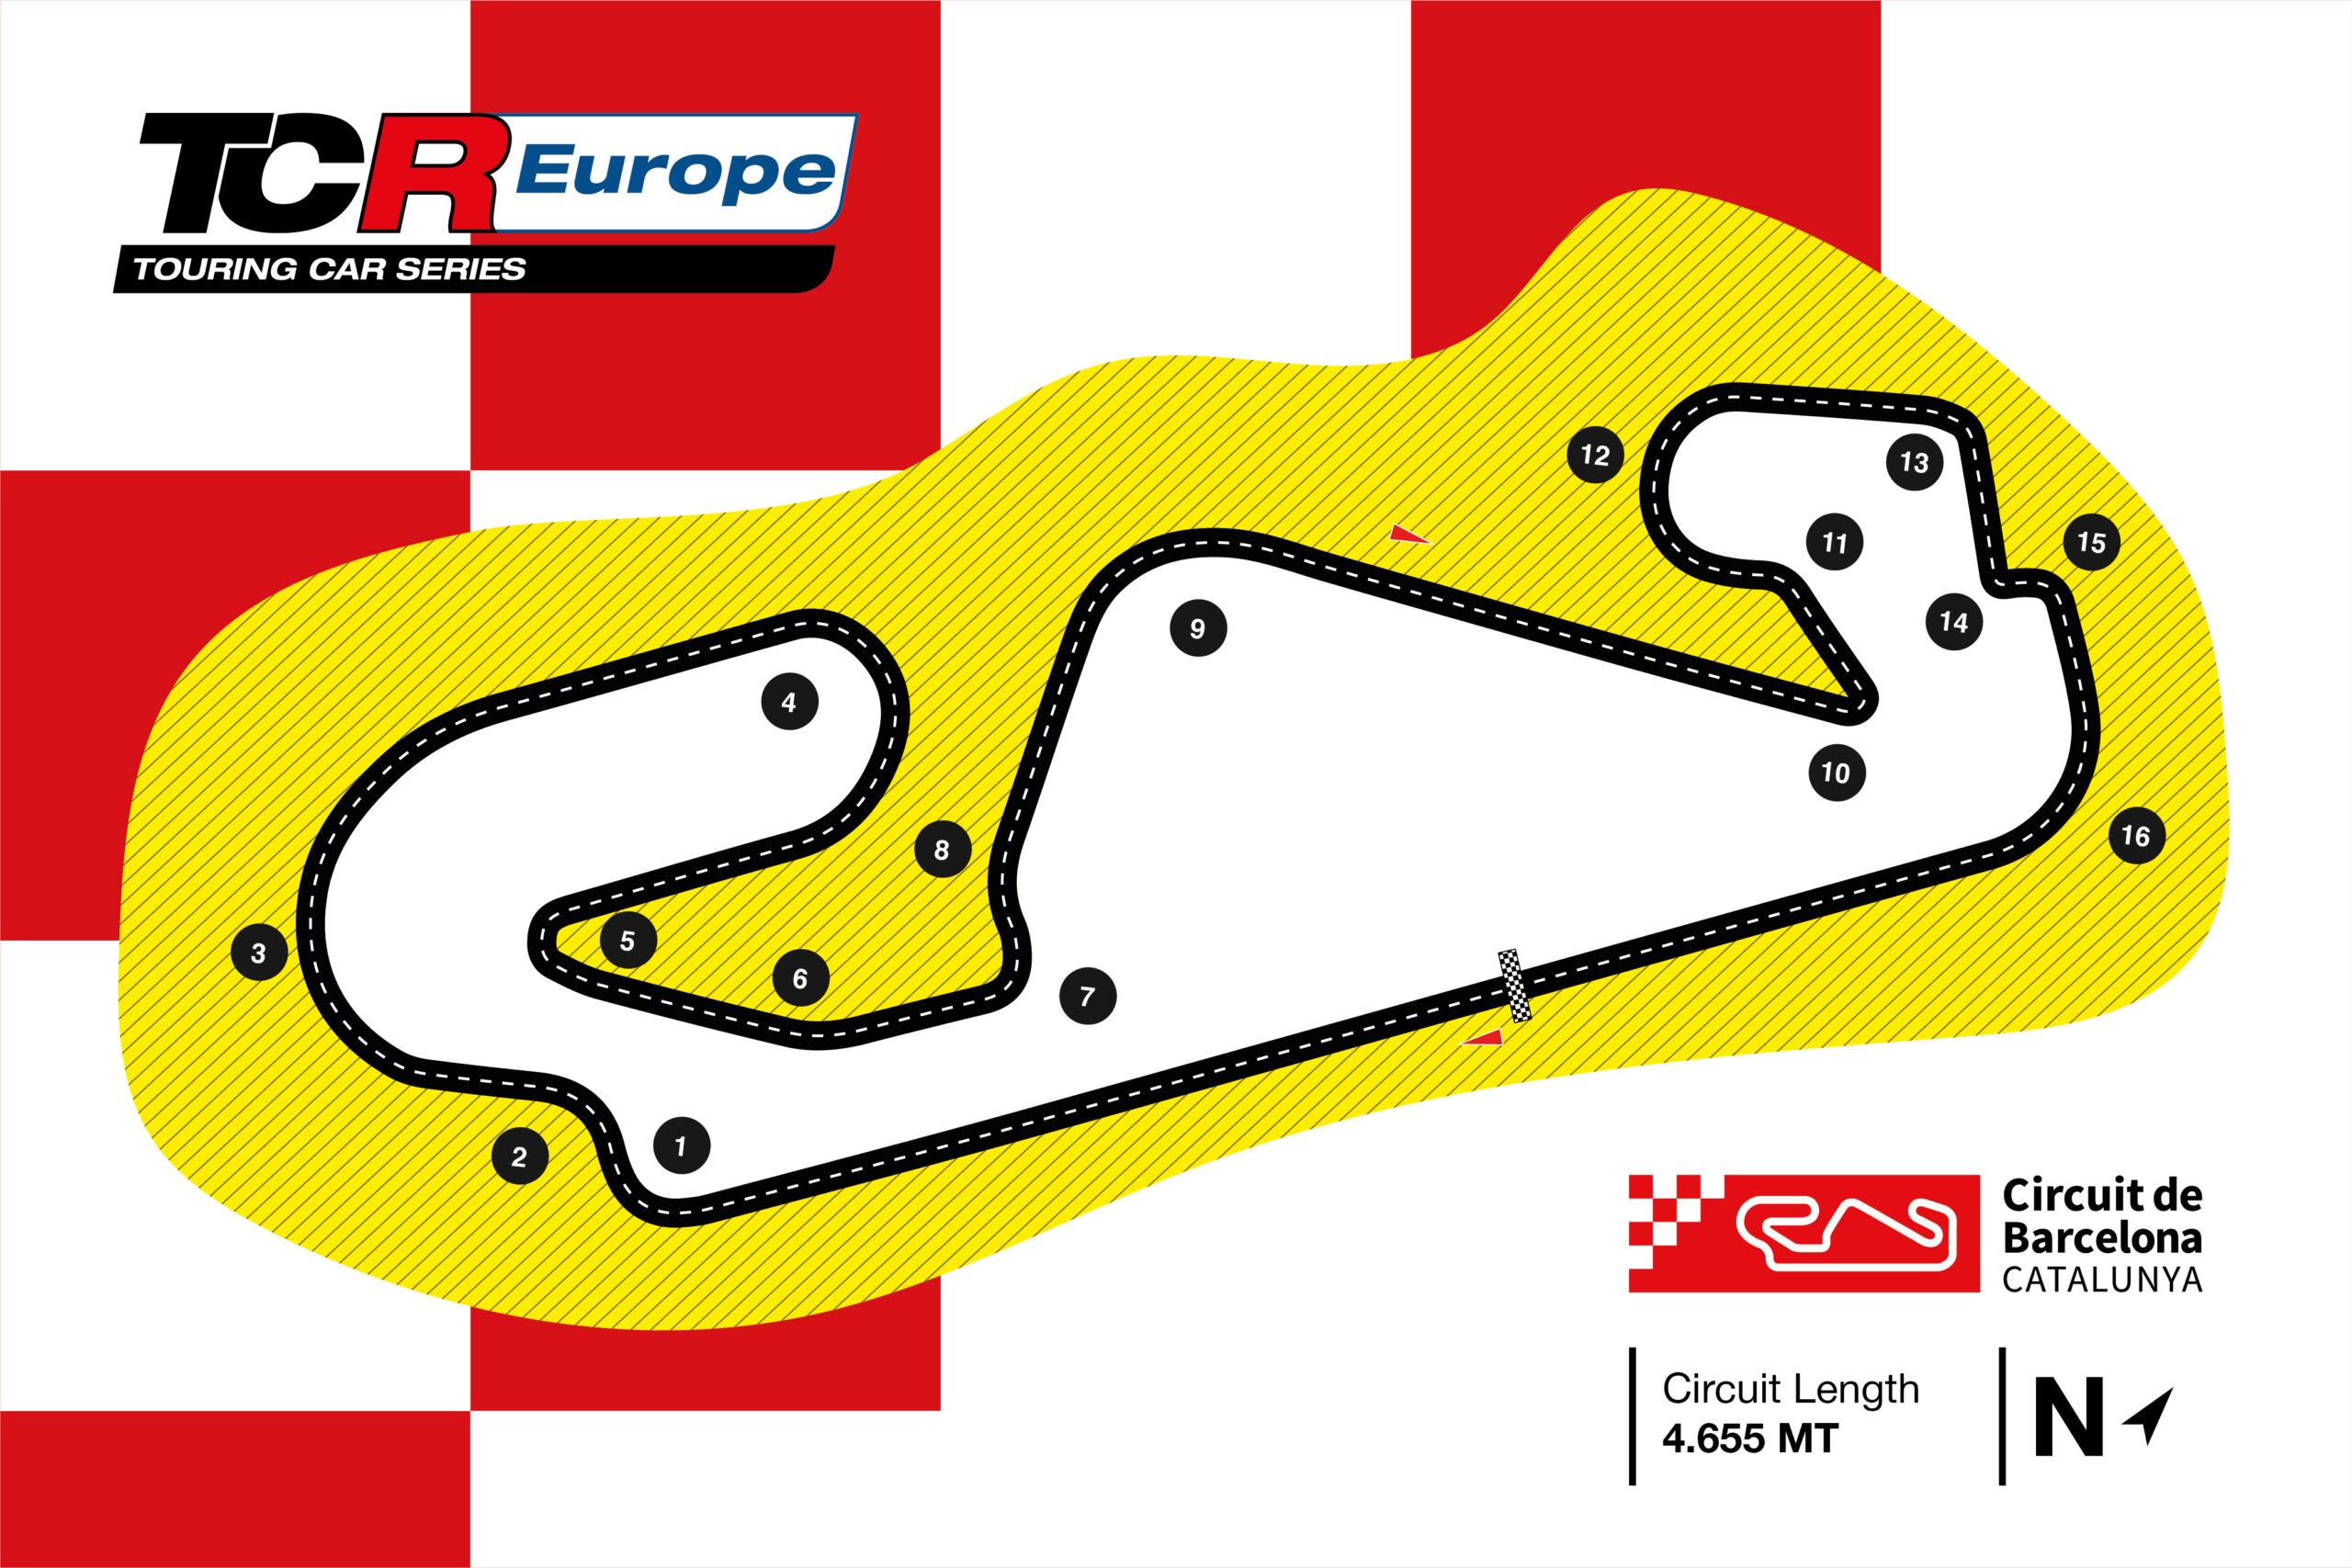 2021_Europe_Tracks_07Barcelona_ecd45e3313085c5960f4b4c2988cd549